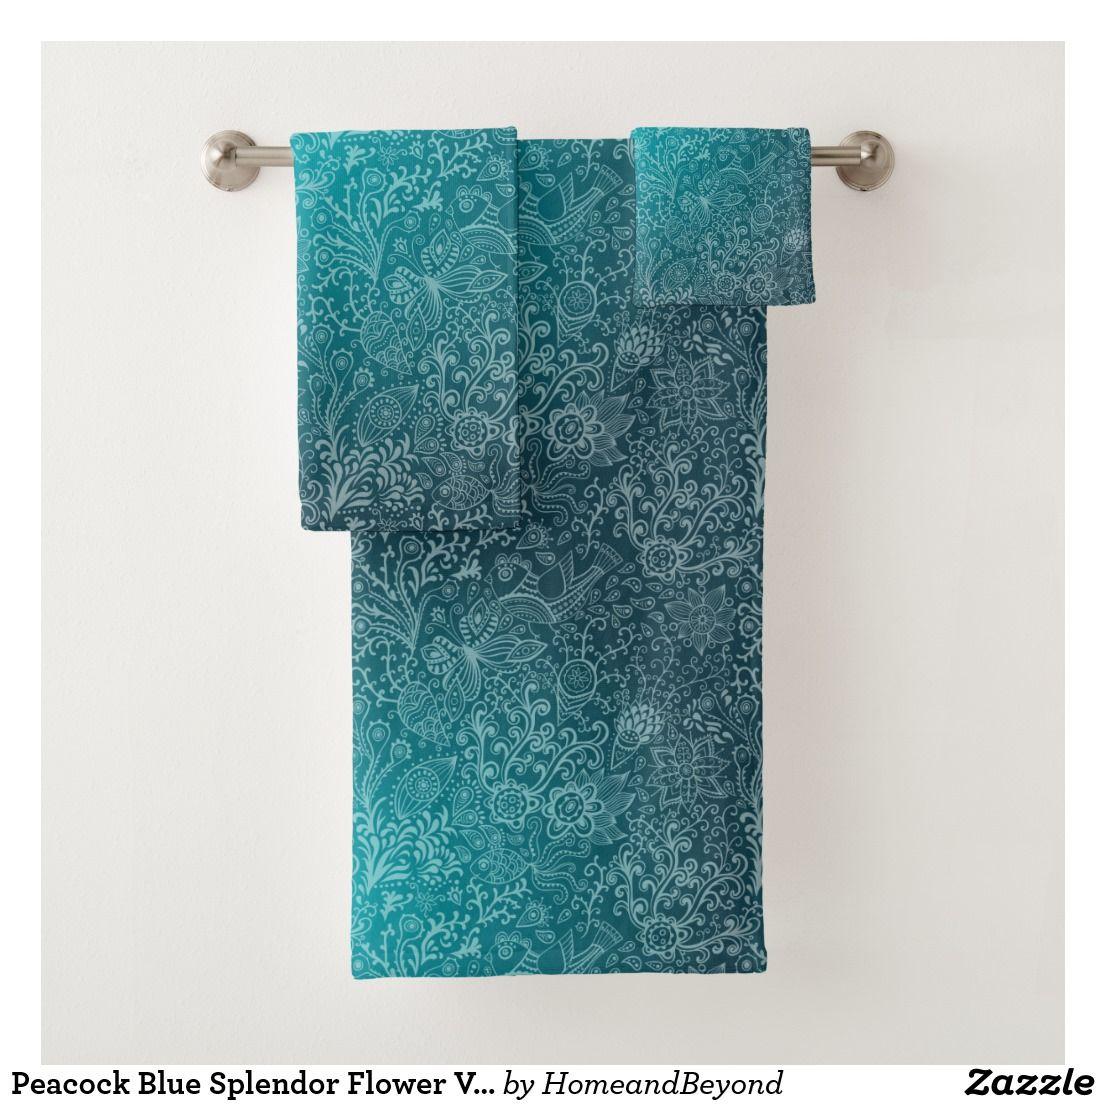 Peacock Blue Splendor Flower Vintage Pattern Bath Towel Set Floral Bath Towels Patterned Bath Towels Peacock Bathroom